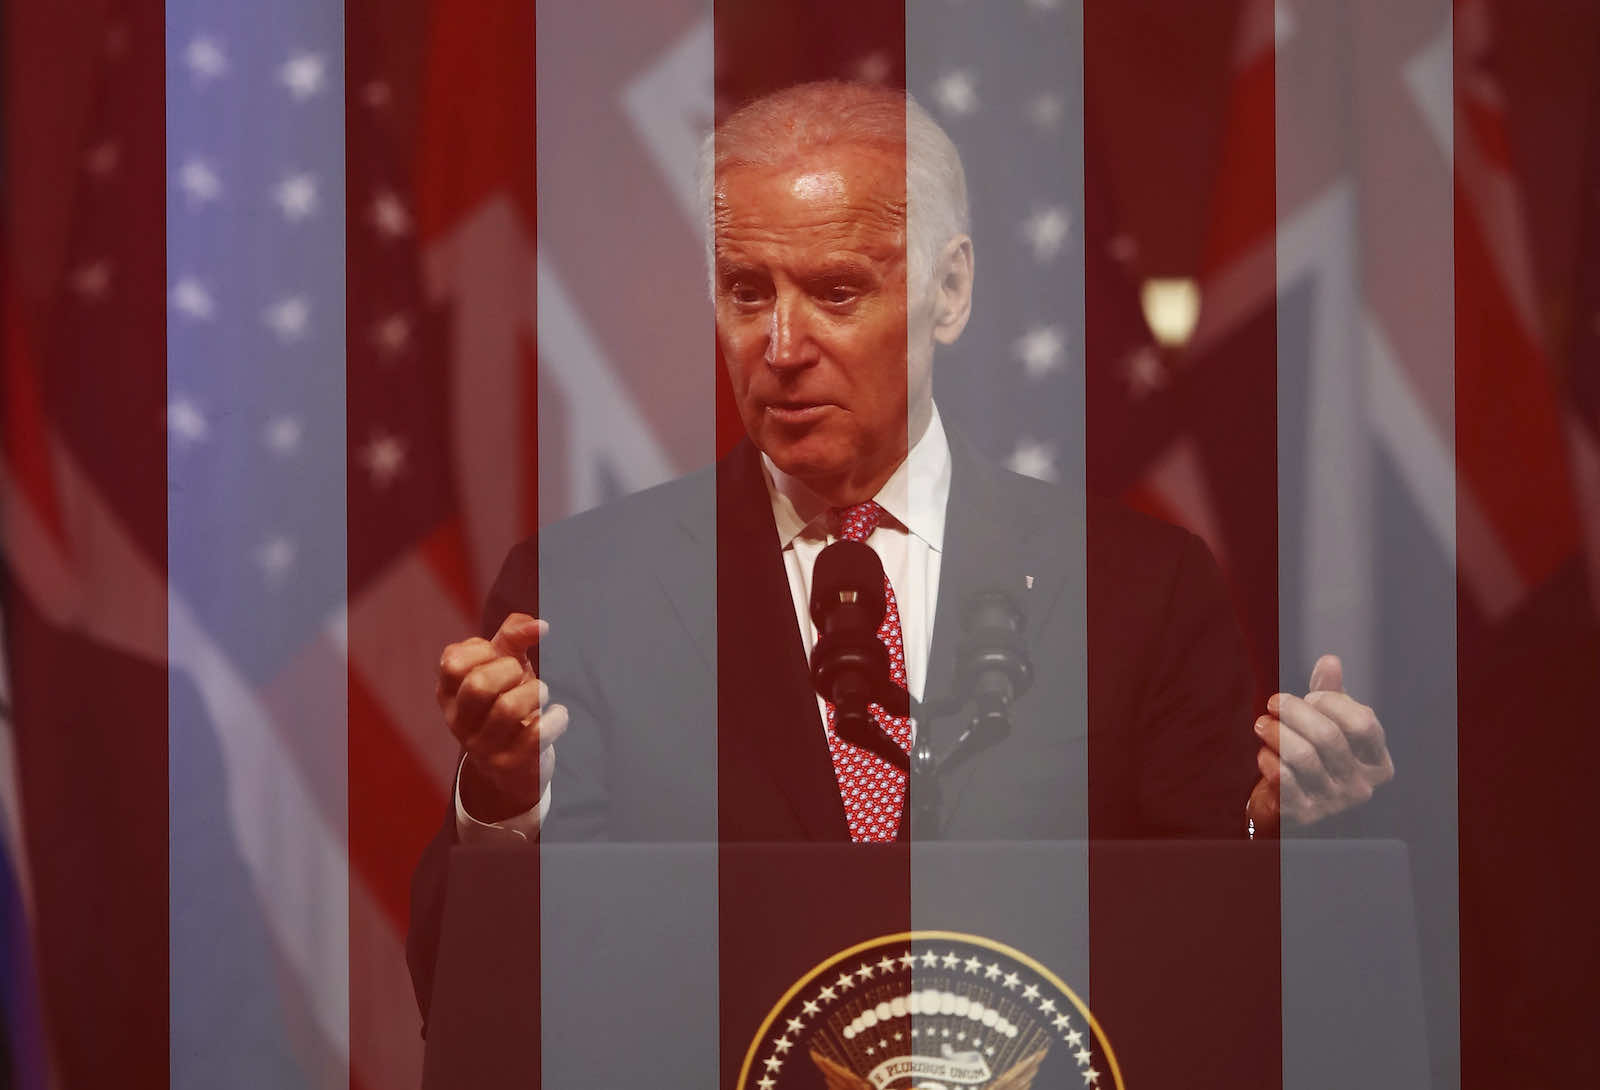 Joe Biden, during a 2016 visit to Australia as Vice President (Ryan Pierse/Getty Images)